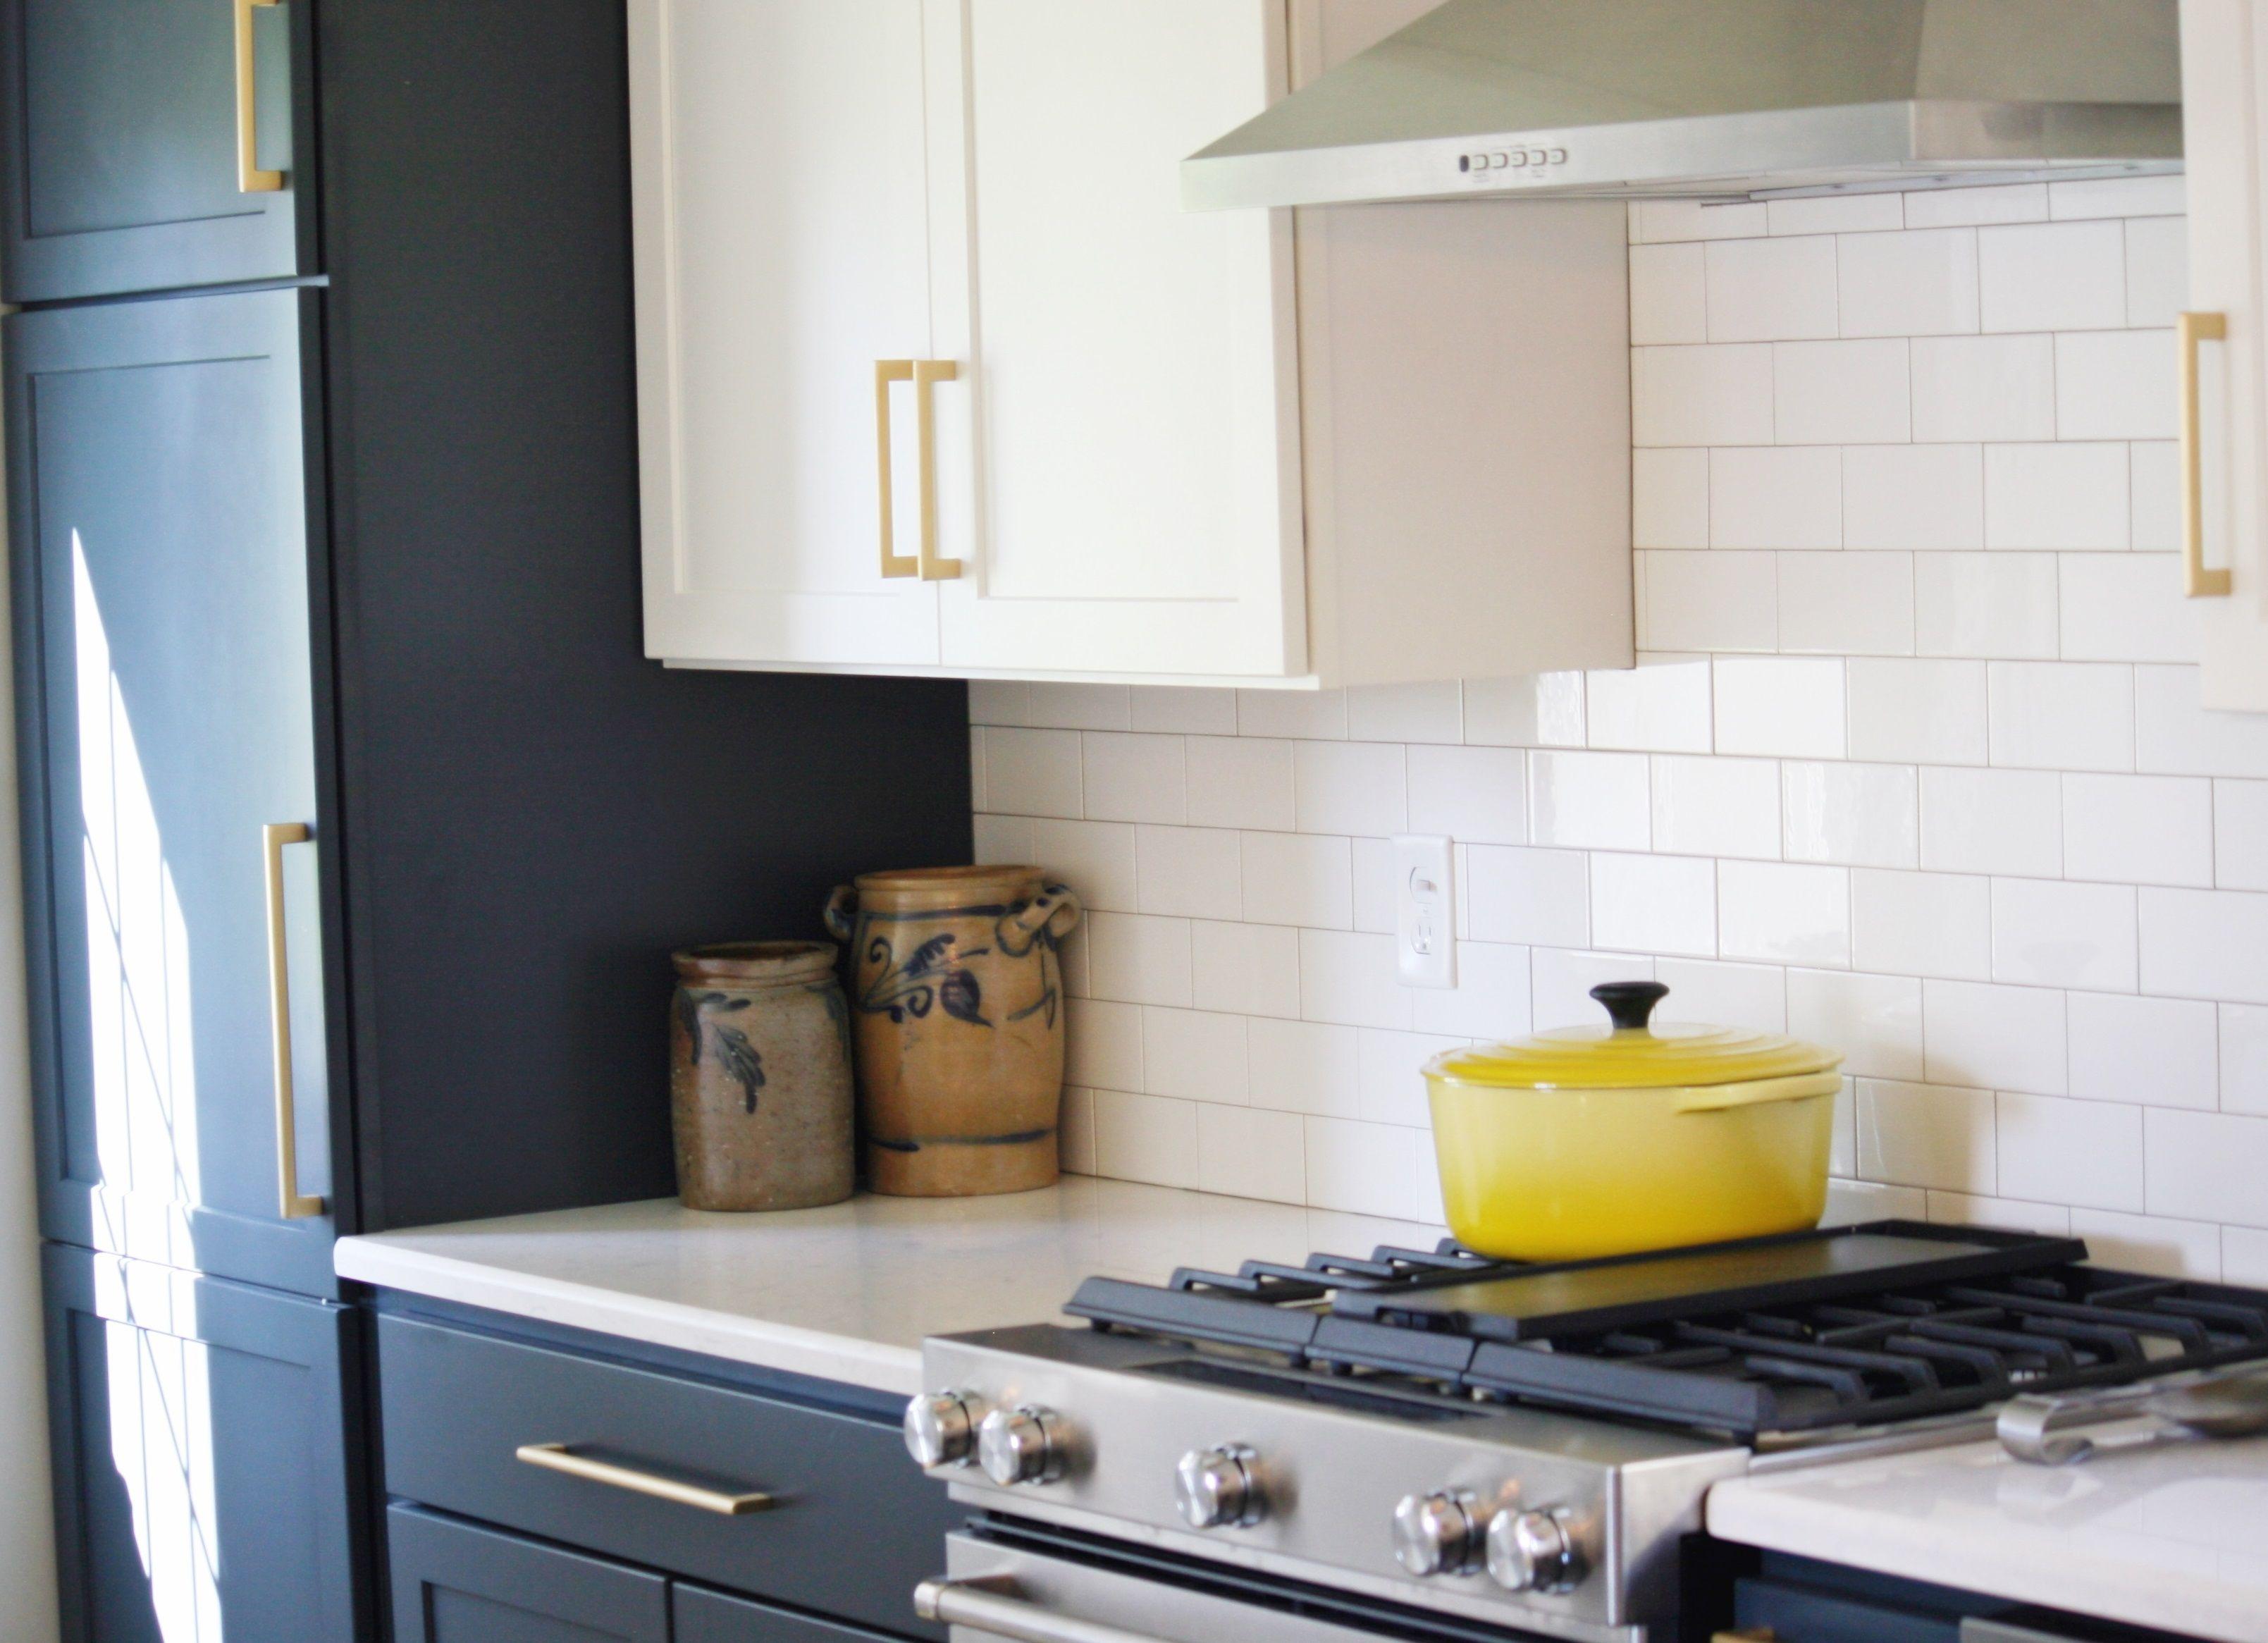 Homecrest Cabinetry Alpine White Cadet Blue On Sedona Door Style Kohler Whitehaven Sink Brizo Faucet Litze Kitchen Design Kitchen Remodel Home Kitchens